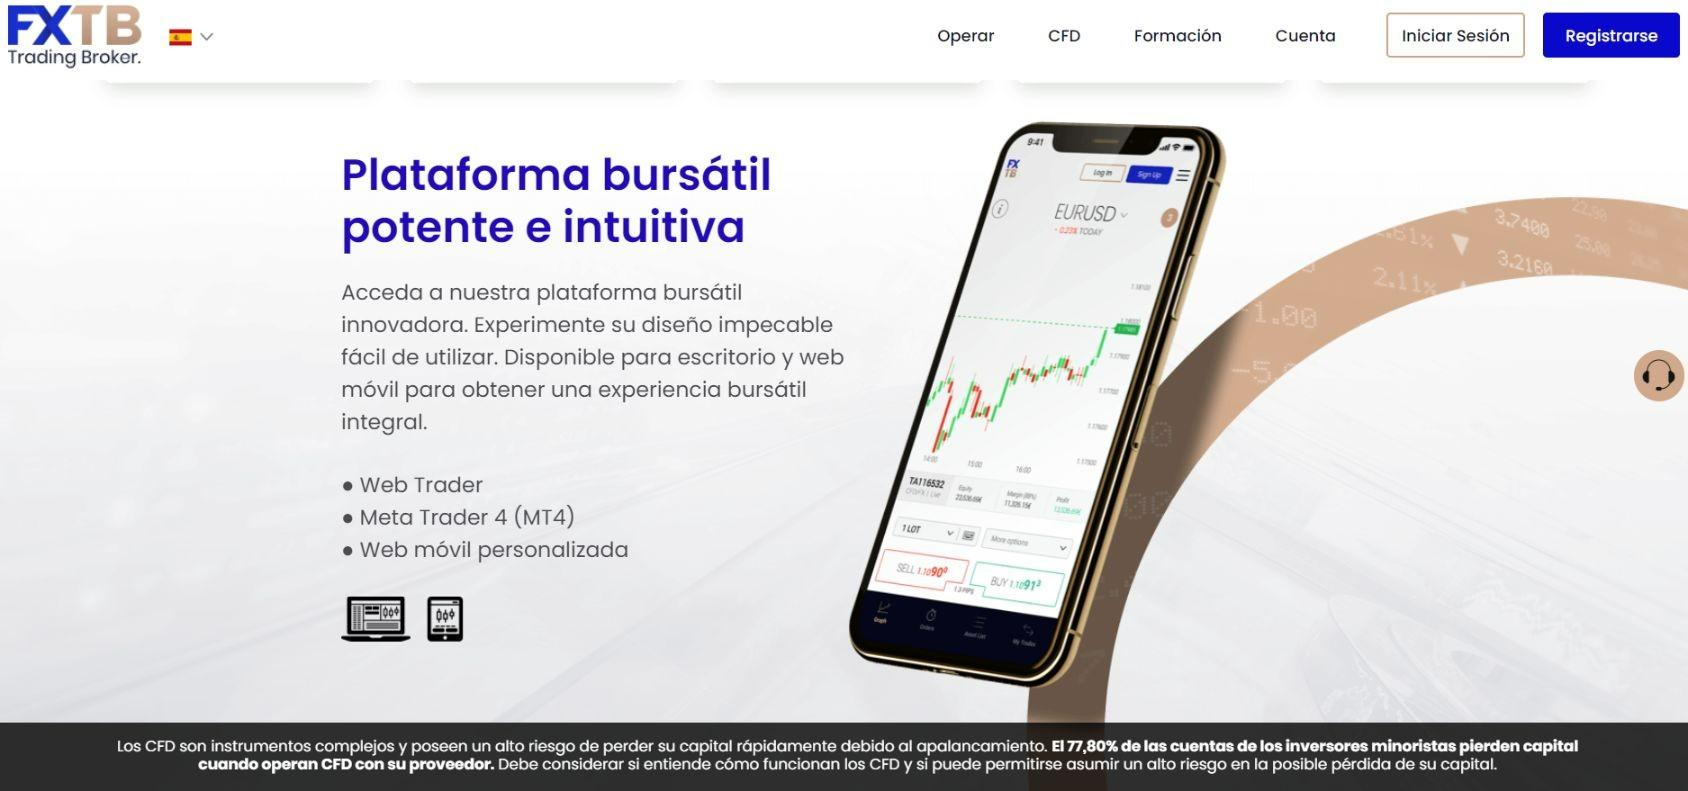 Plataformas de trading - FXTB